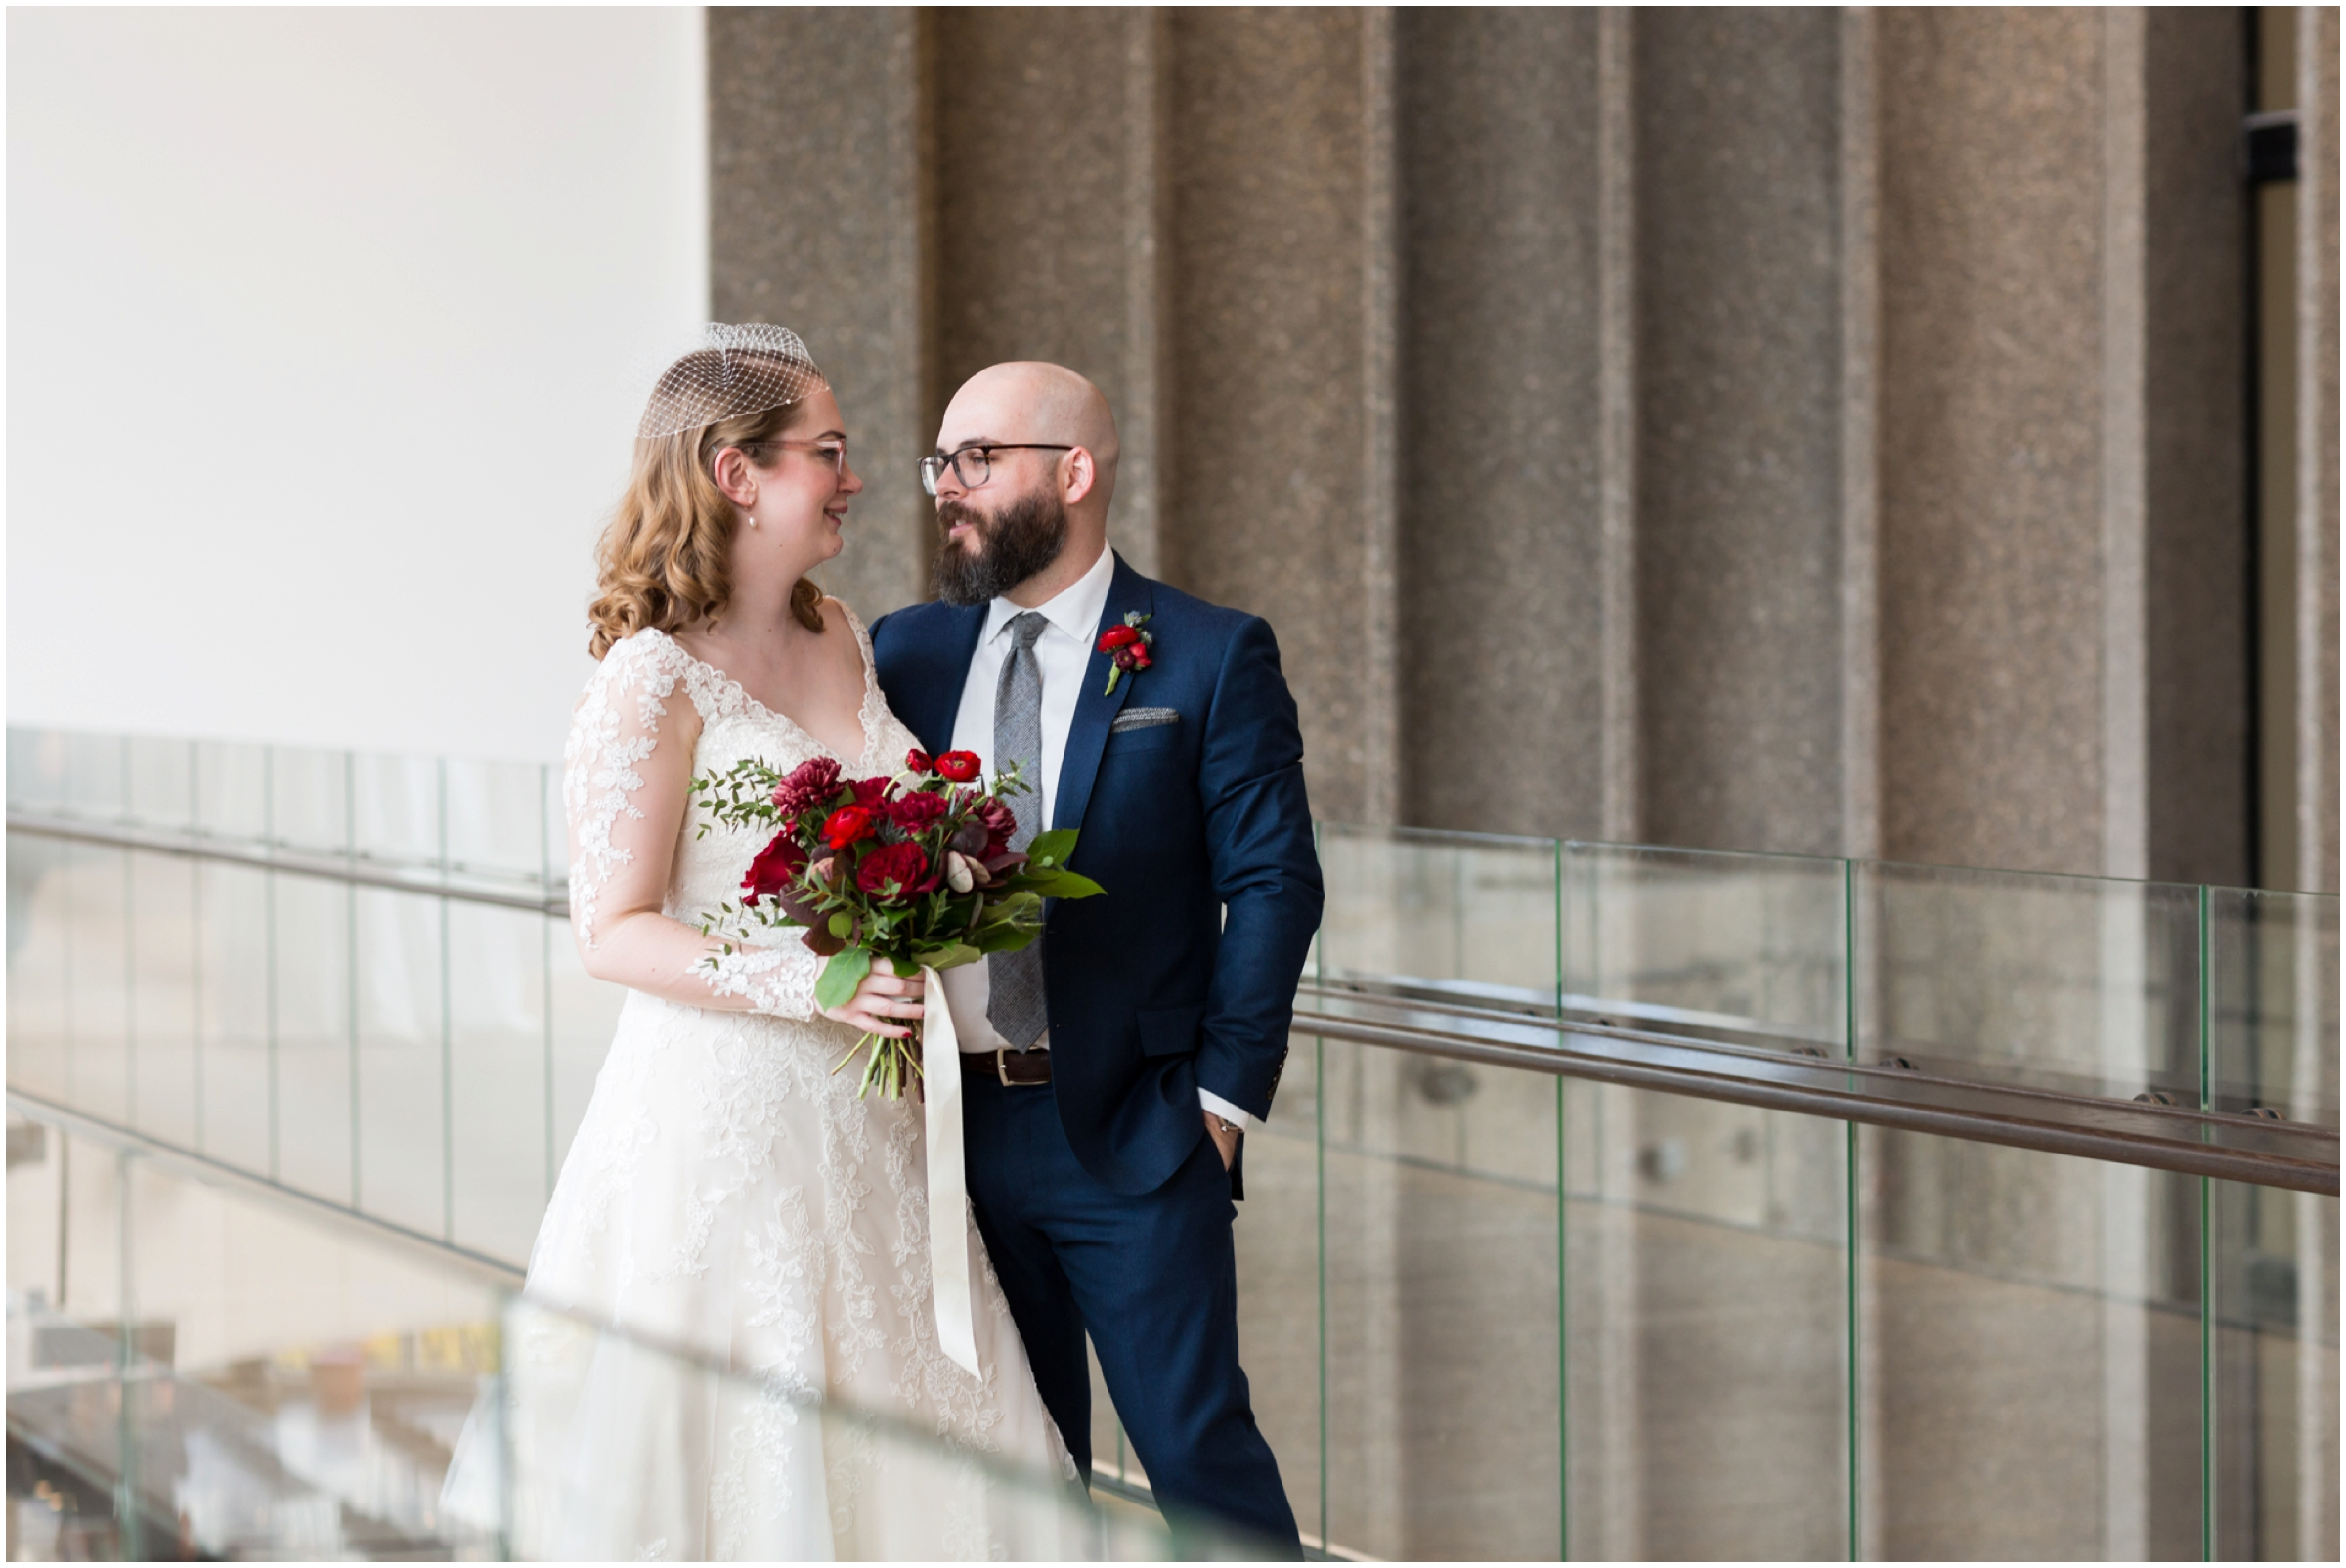 Ottaw Wedding Allison Andrew - (Selena Phillips-Boyle)_0043.jpg